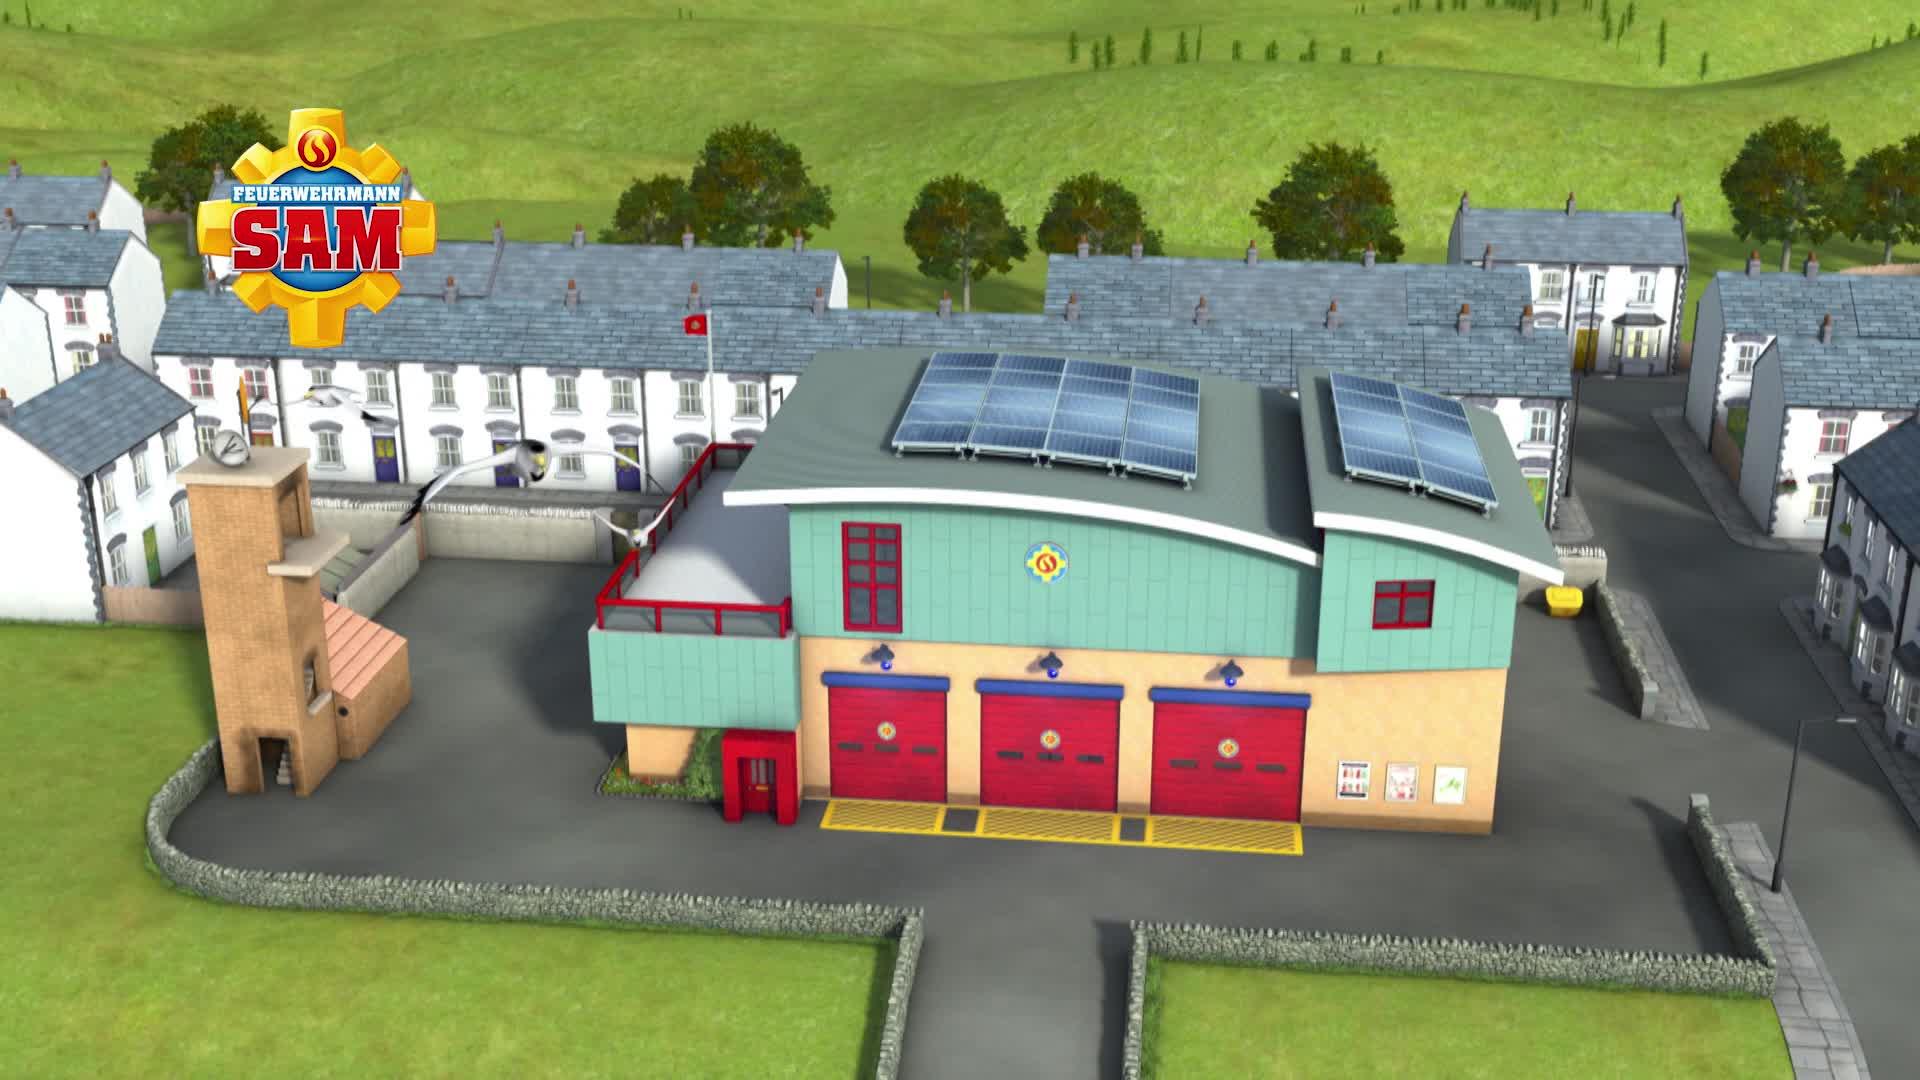 Feuerwehrmann Sam Neue Feuerwehrstation Und Adventskalender Simba Toys Video Simba Dickie Com